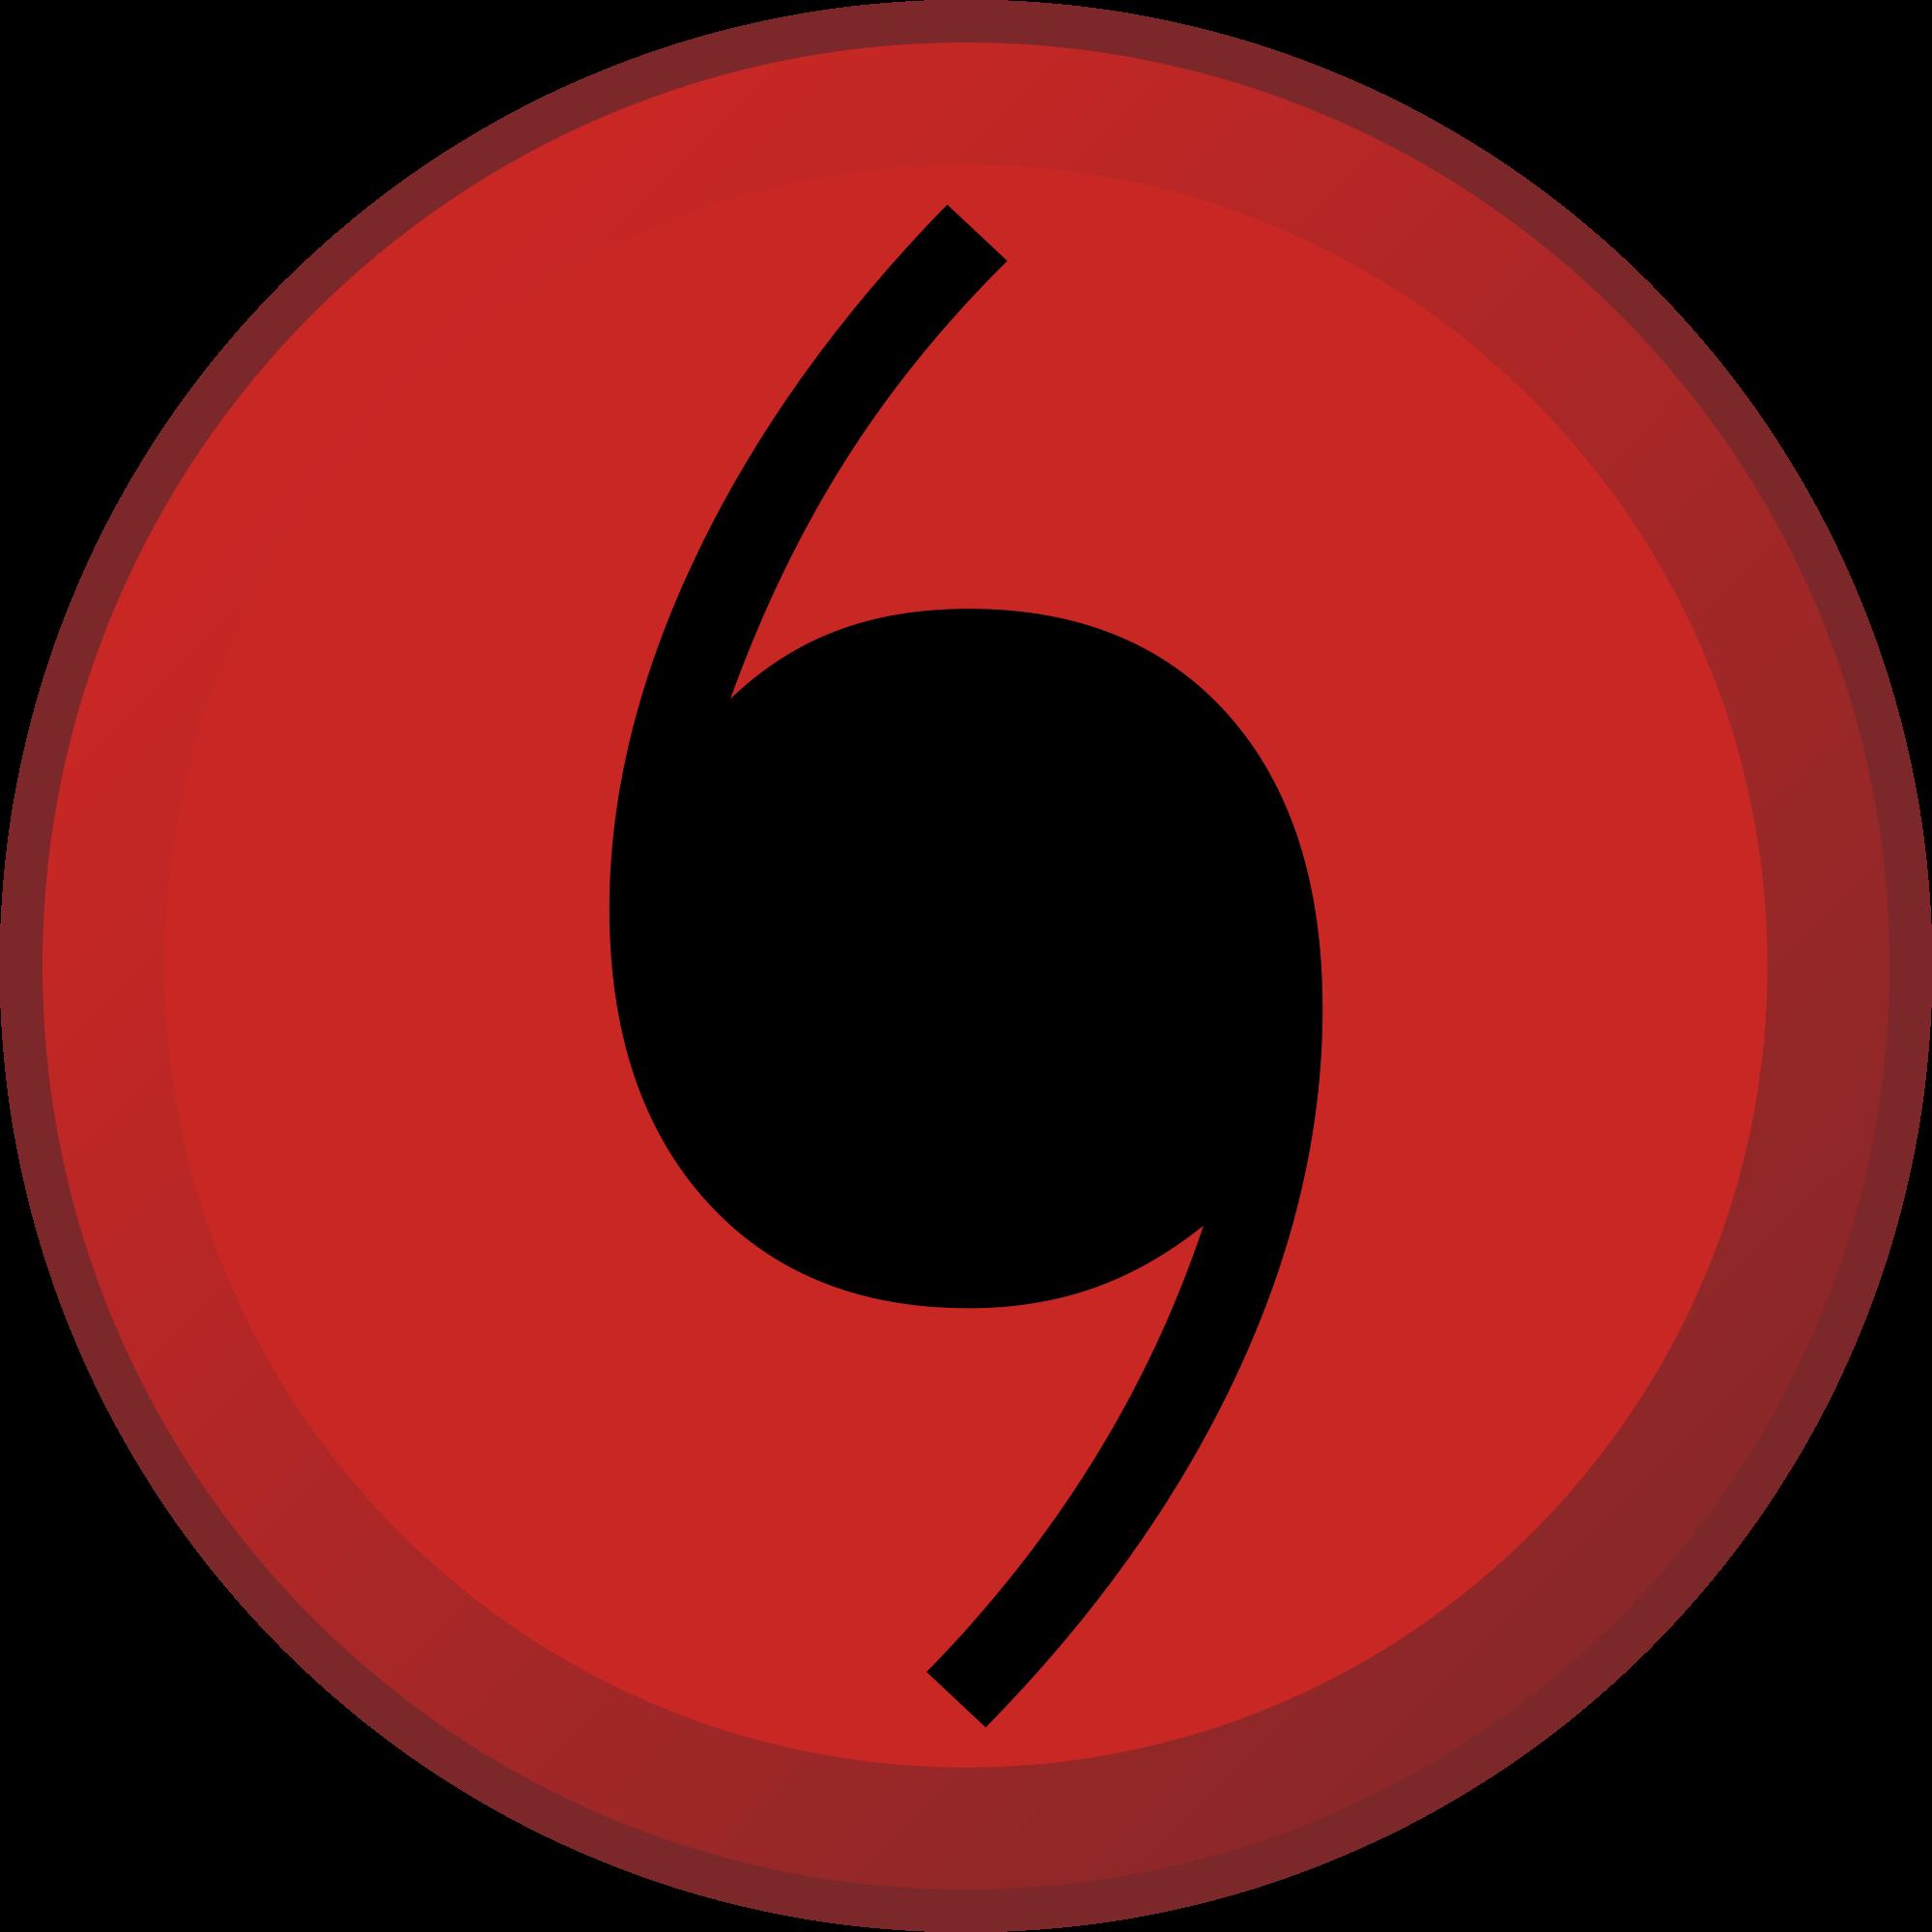 Warning cliparts zone icon. Hurricane clipart logo